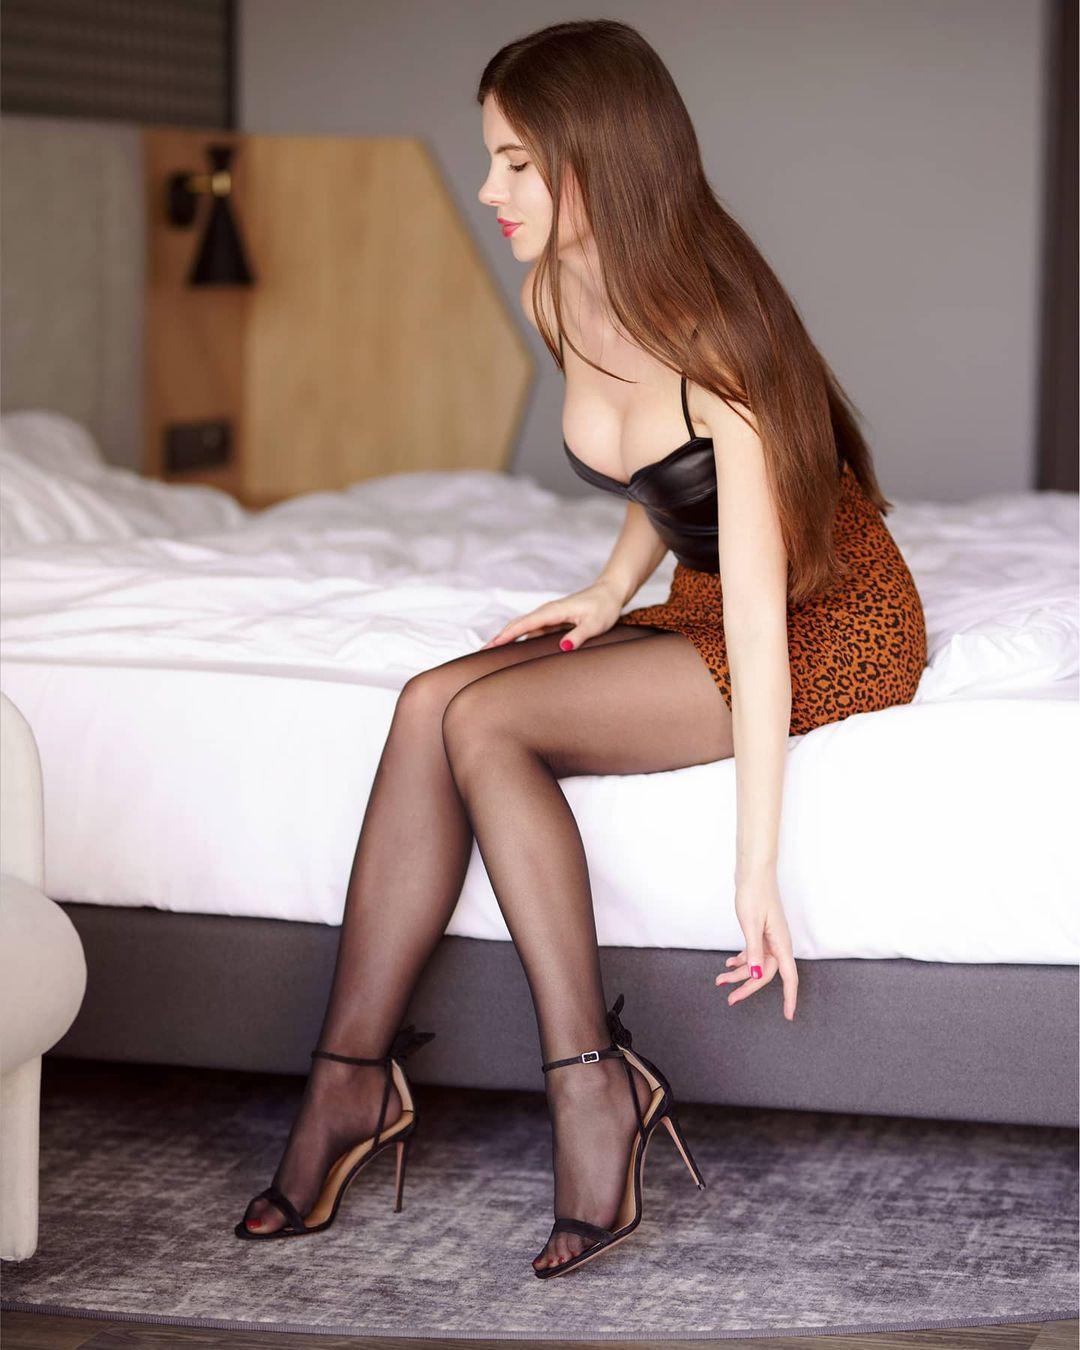 Ariadna - девушка дня из инстаграм (27 Фото) 16